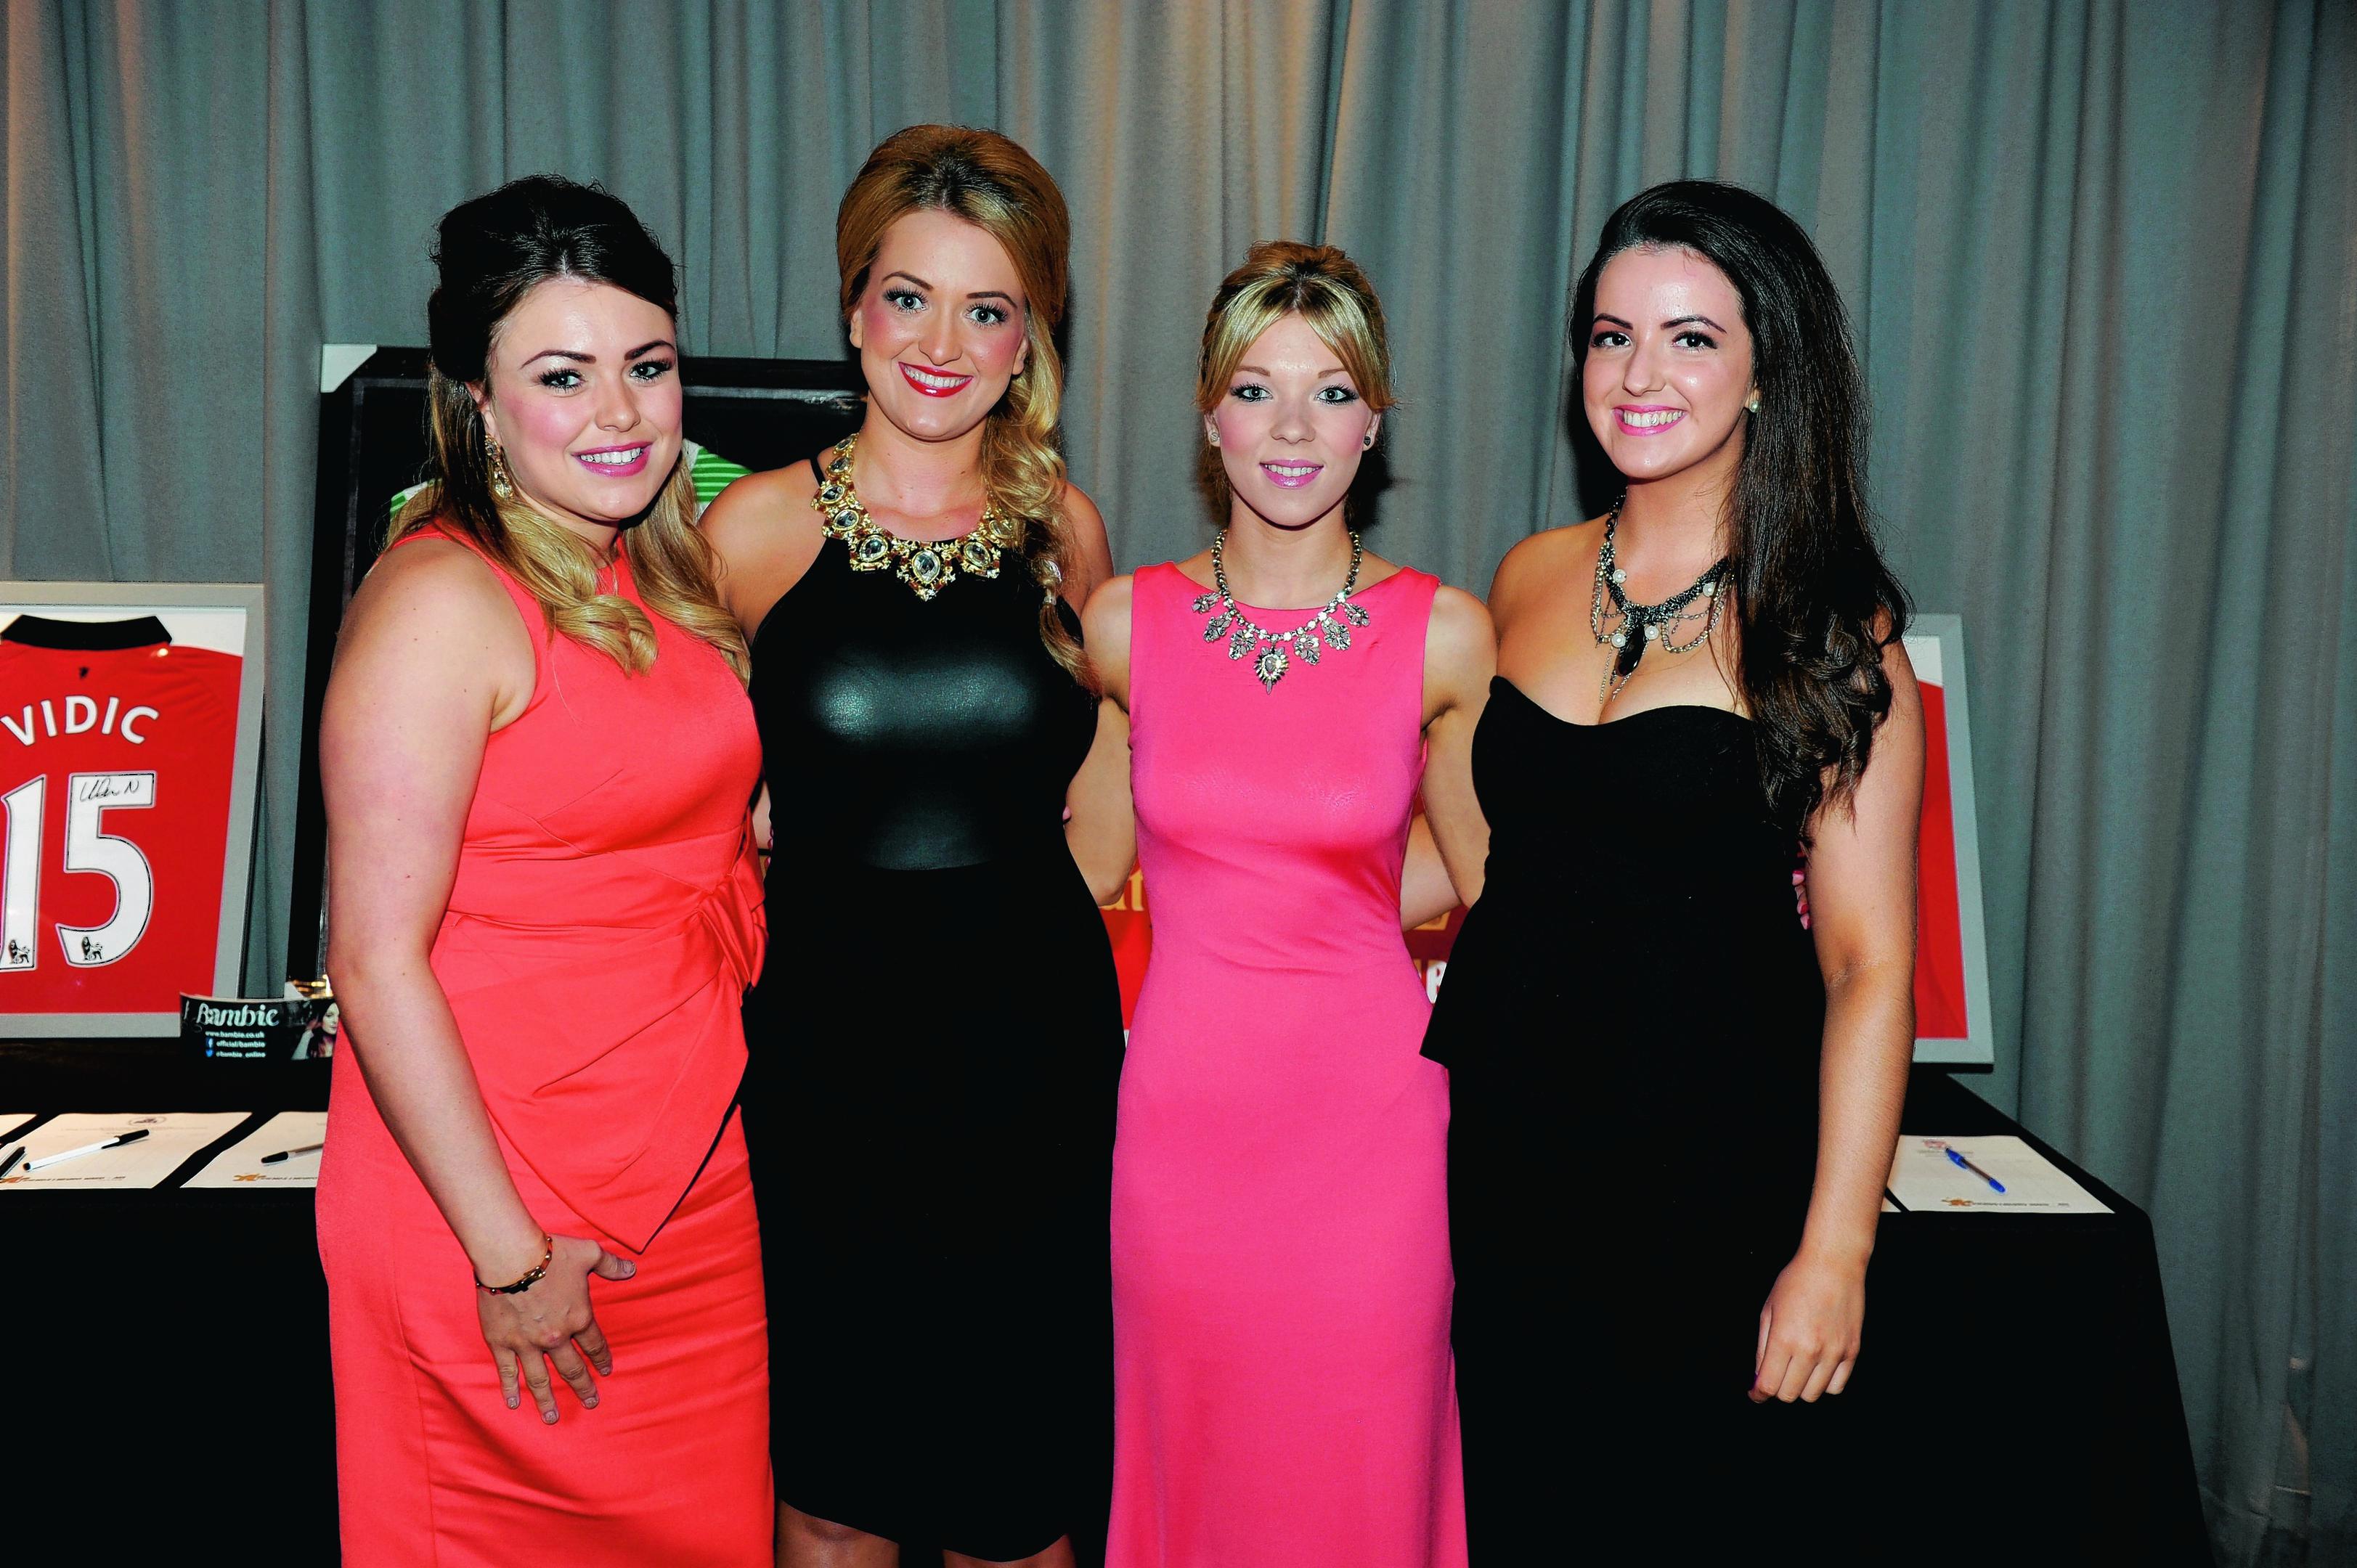 Lauren Michie, Becky Bowers, Amanda Gray and Lucy Gerrard.